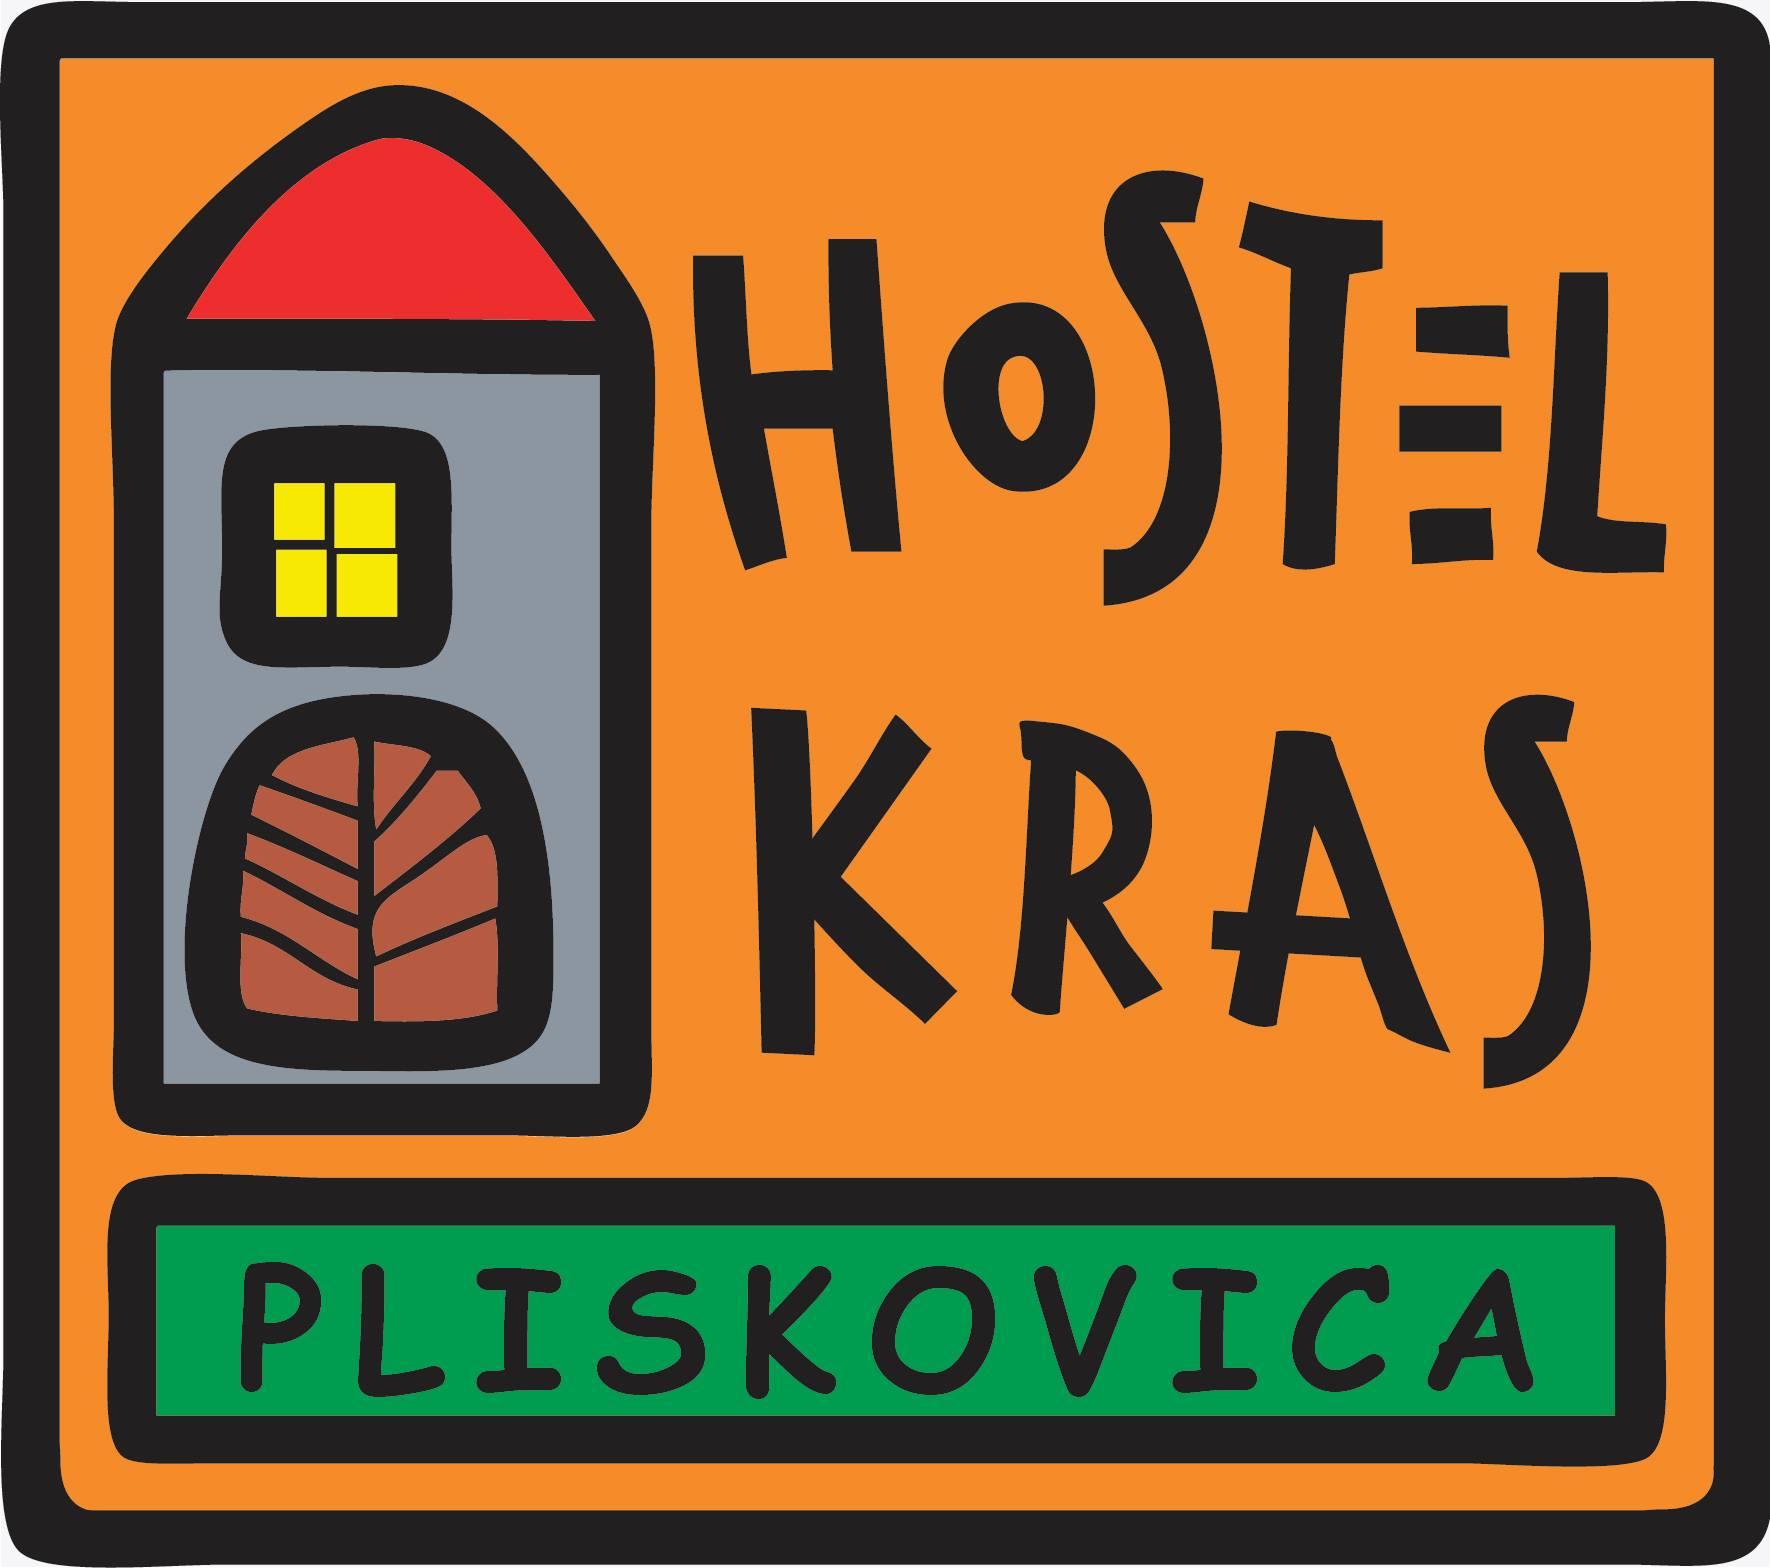 hostel kras pliskovica slovenija